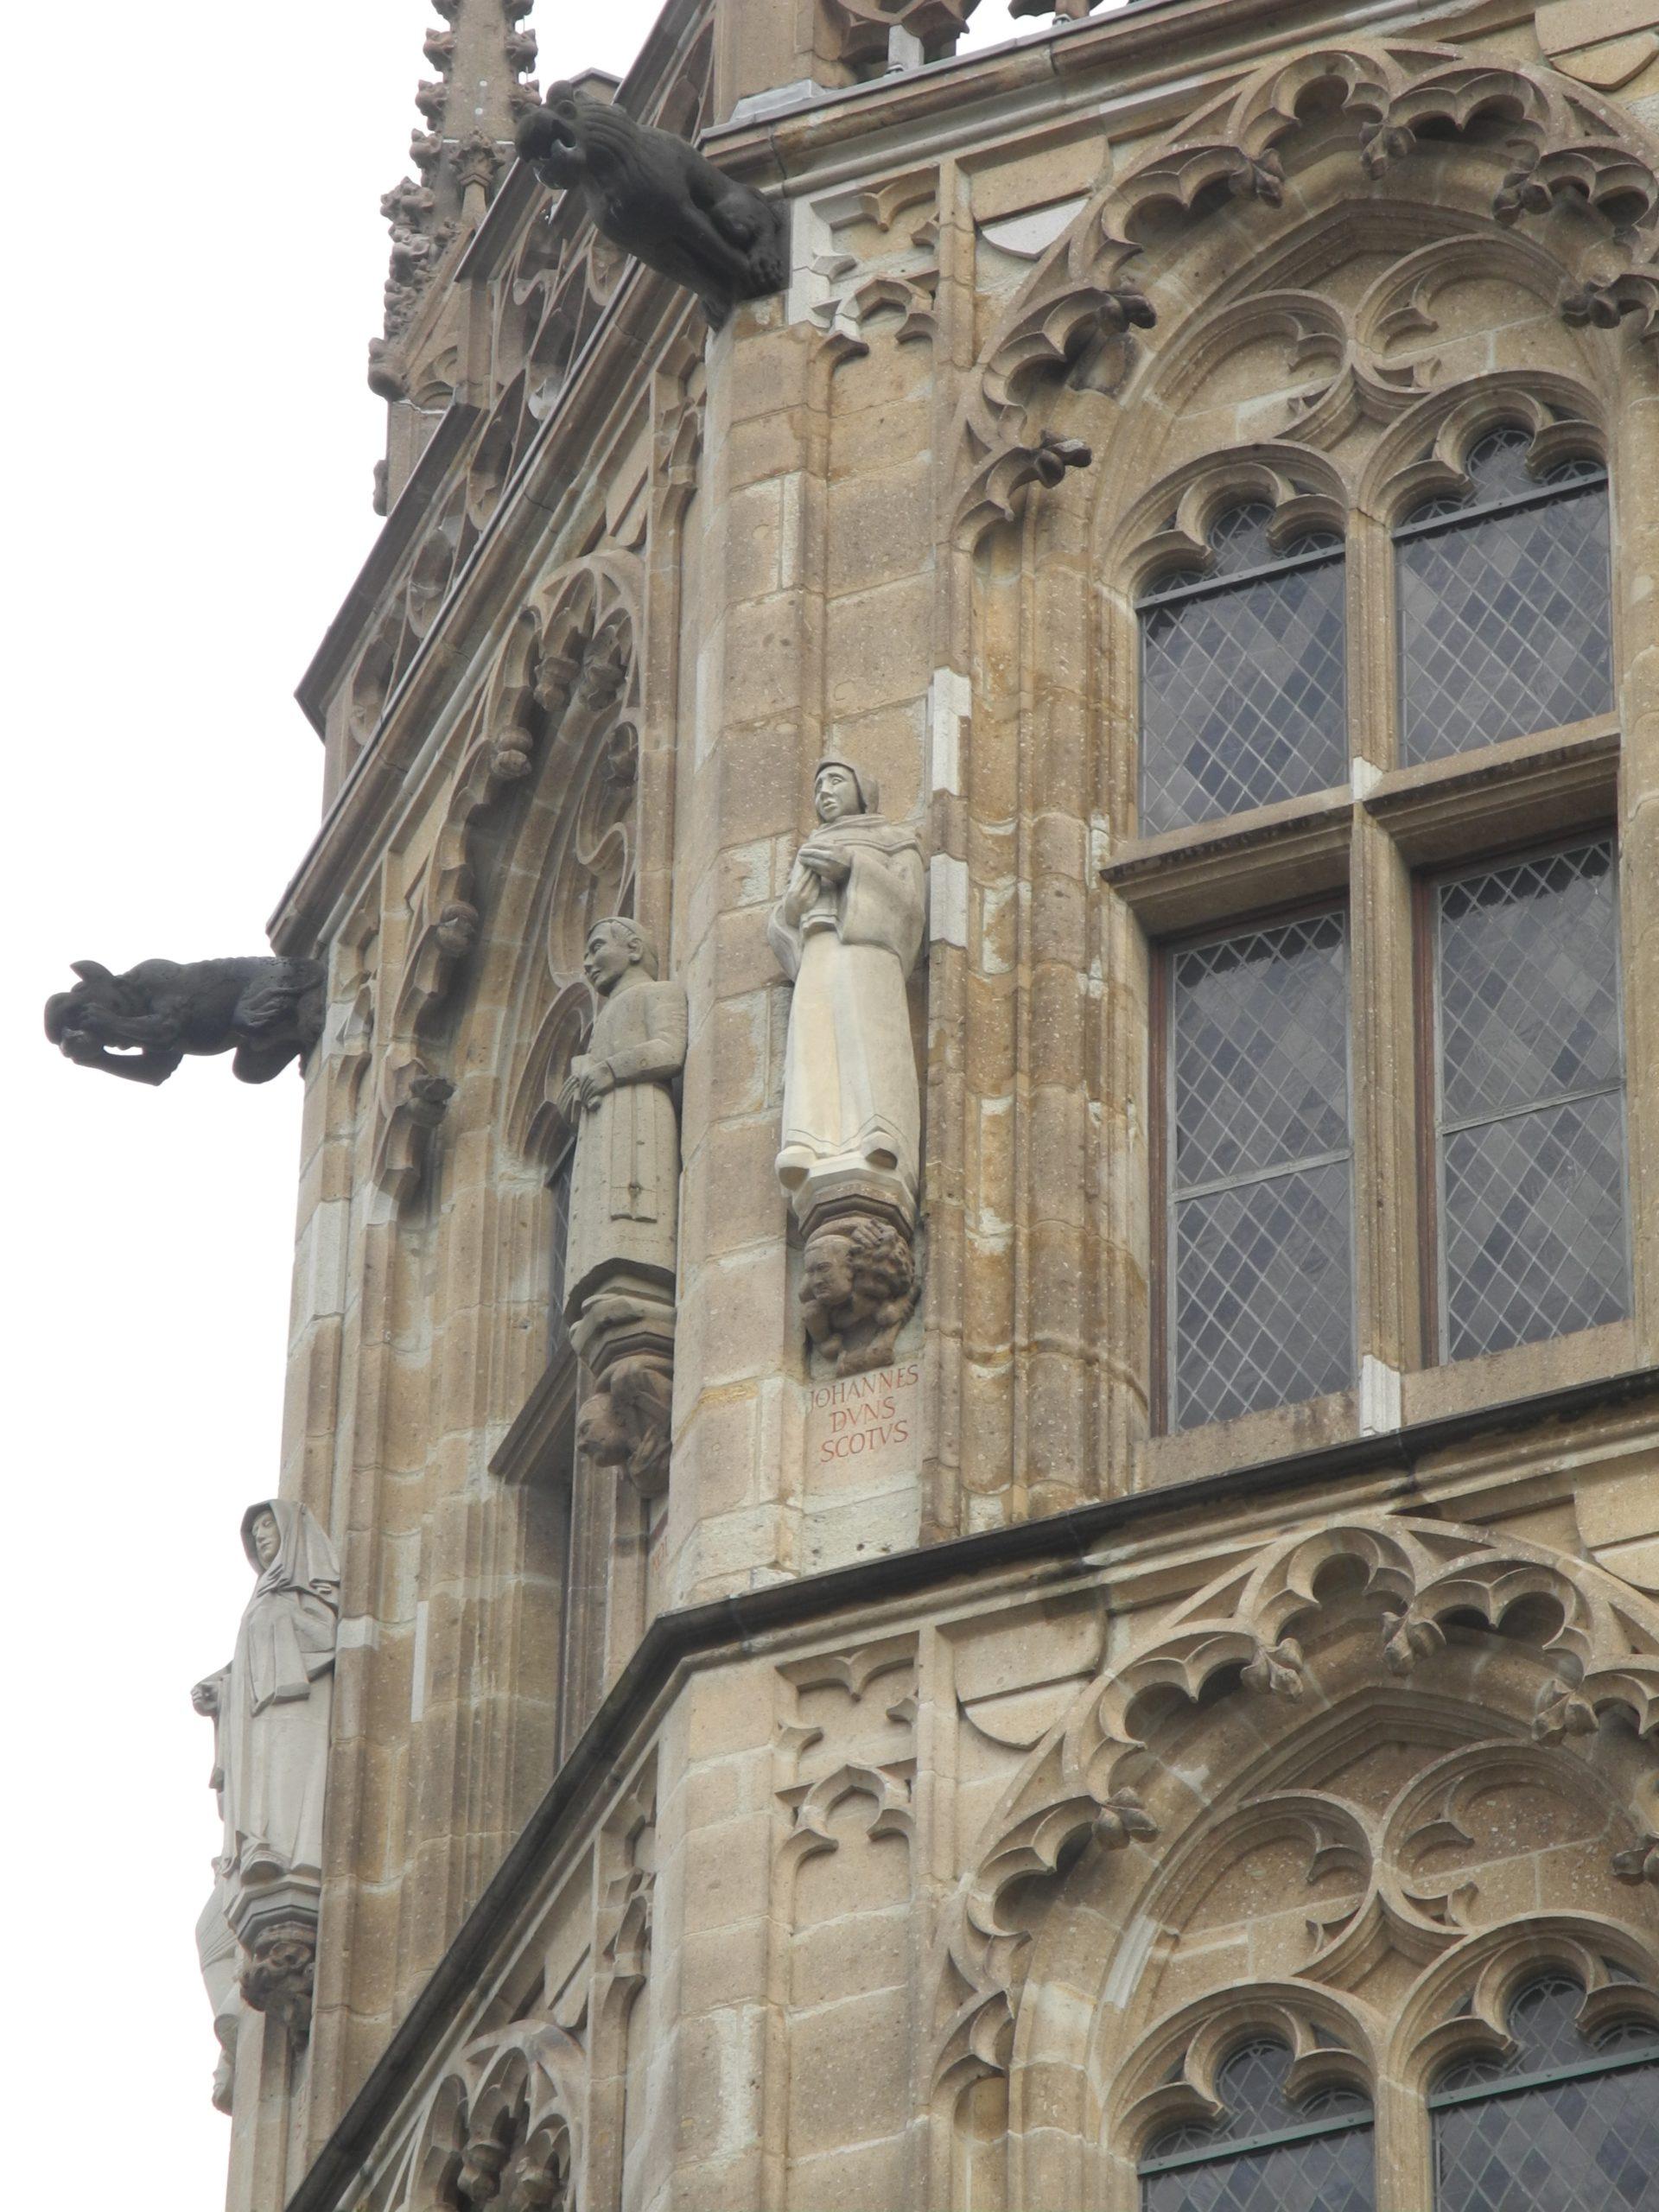 Duns Scotus, Historischer Rathausturm Köln, 2008